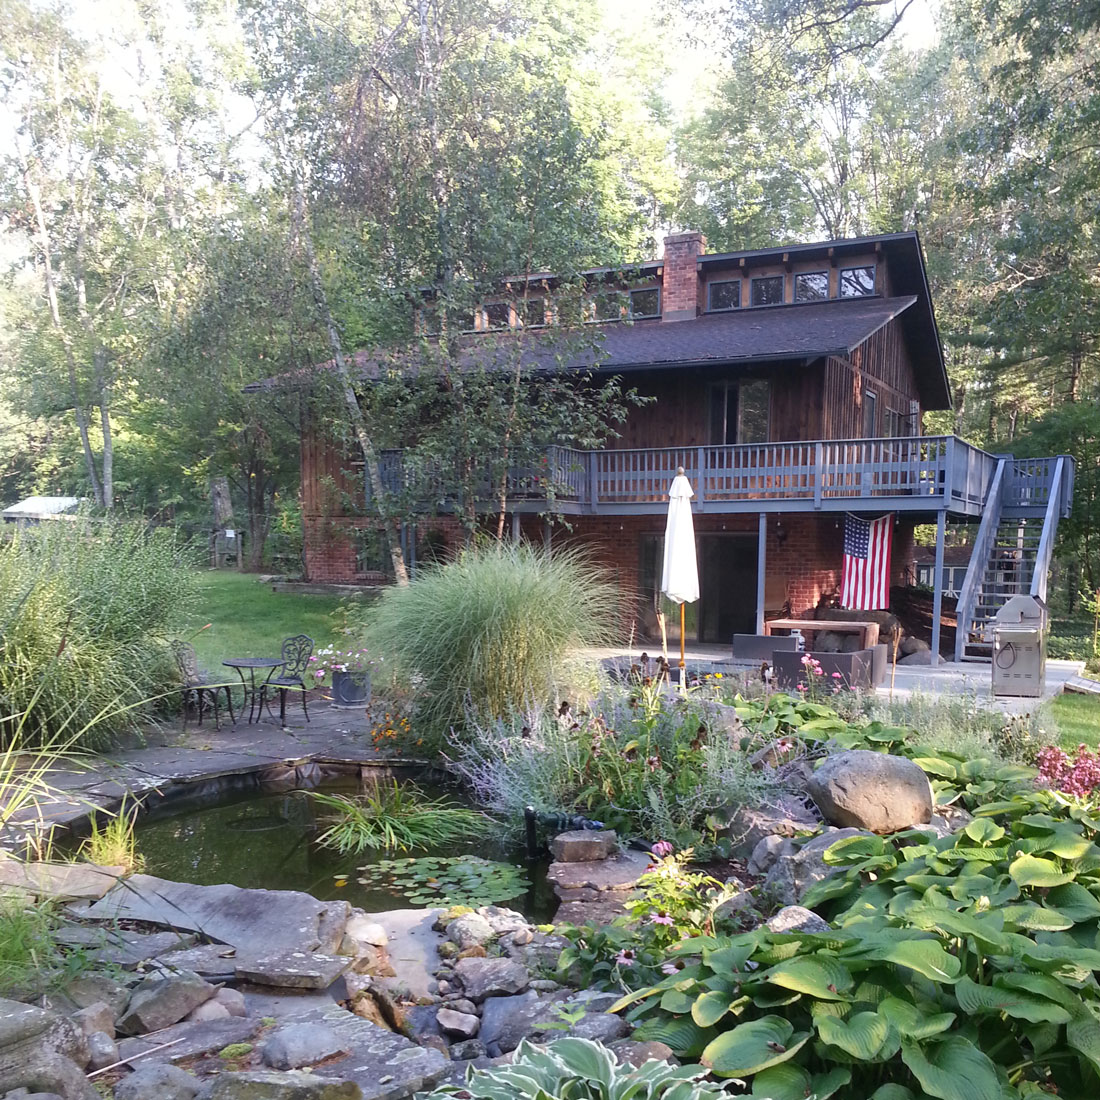 Woodstock Getaway blog post from Courtney Dawley // Found by a Prop Stylist